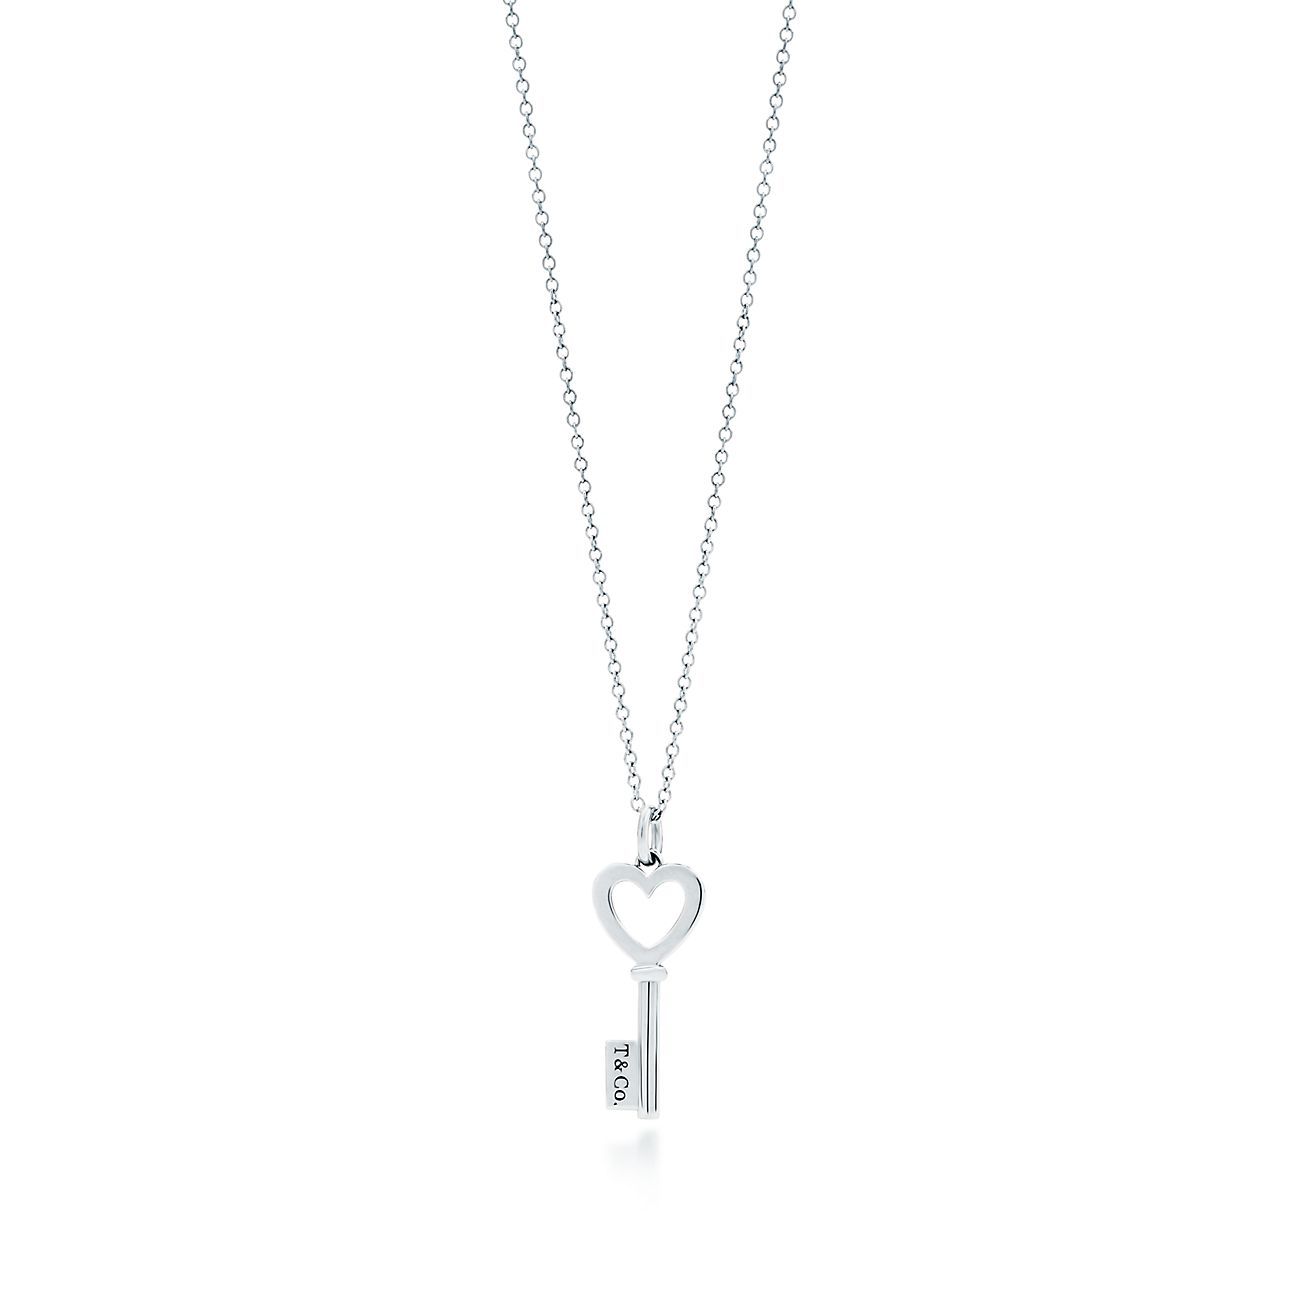 Tiffany Keys Return to Tiffany heart key pendant in sterling silver Tiffany & Co. KRIpiy5